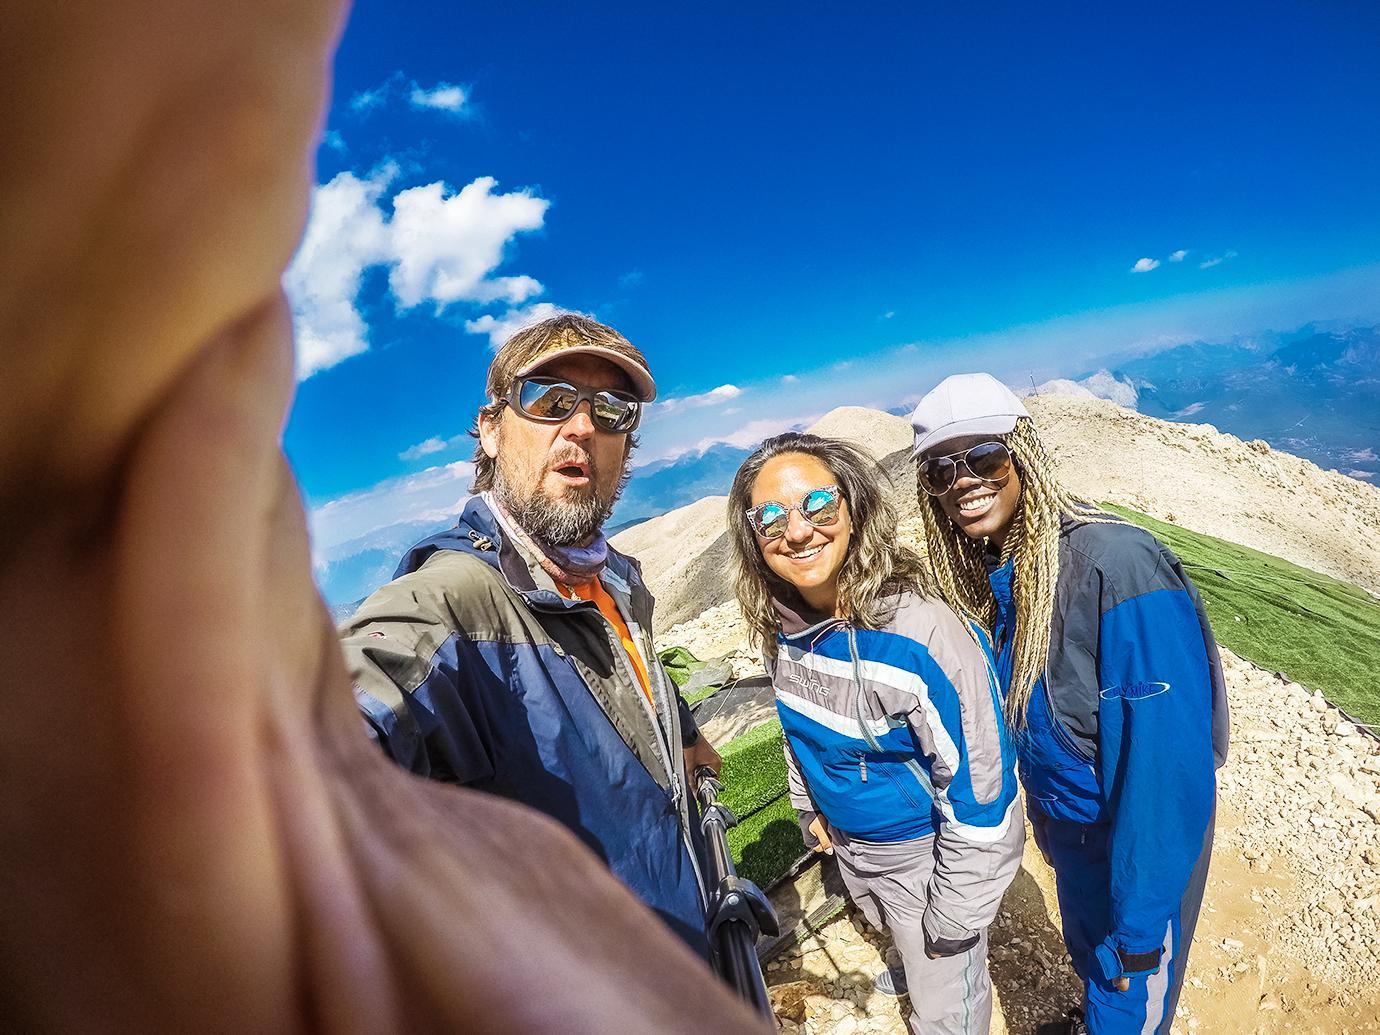 mayowa-paragliding-0027926